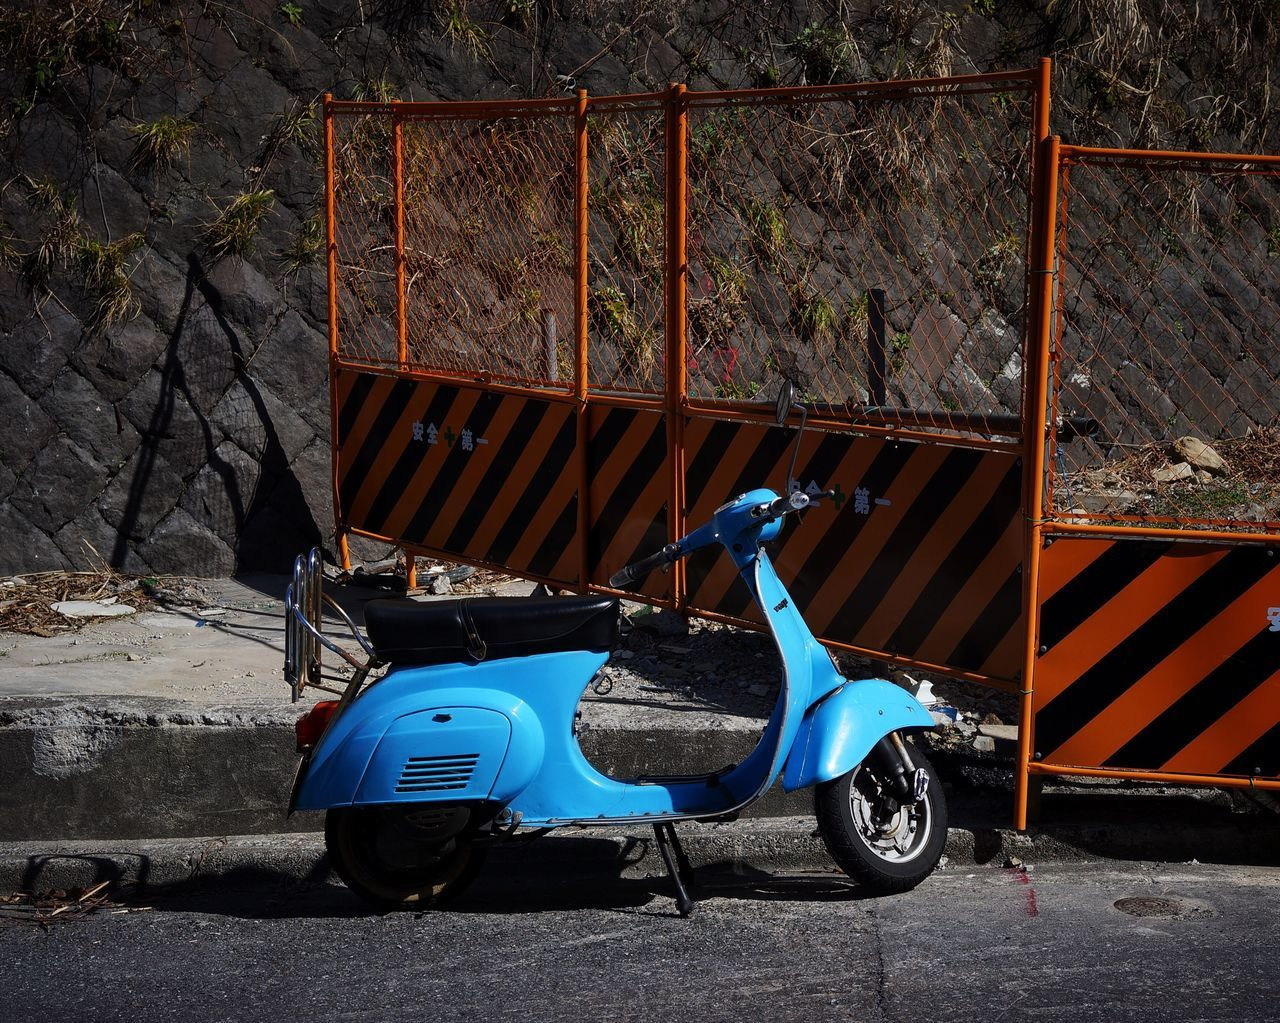 Scooter Fence Transportation